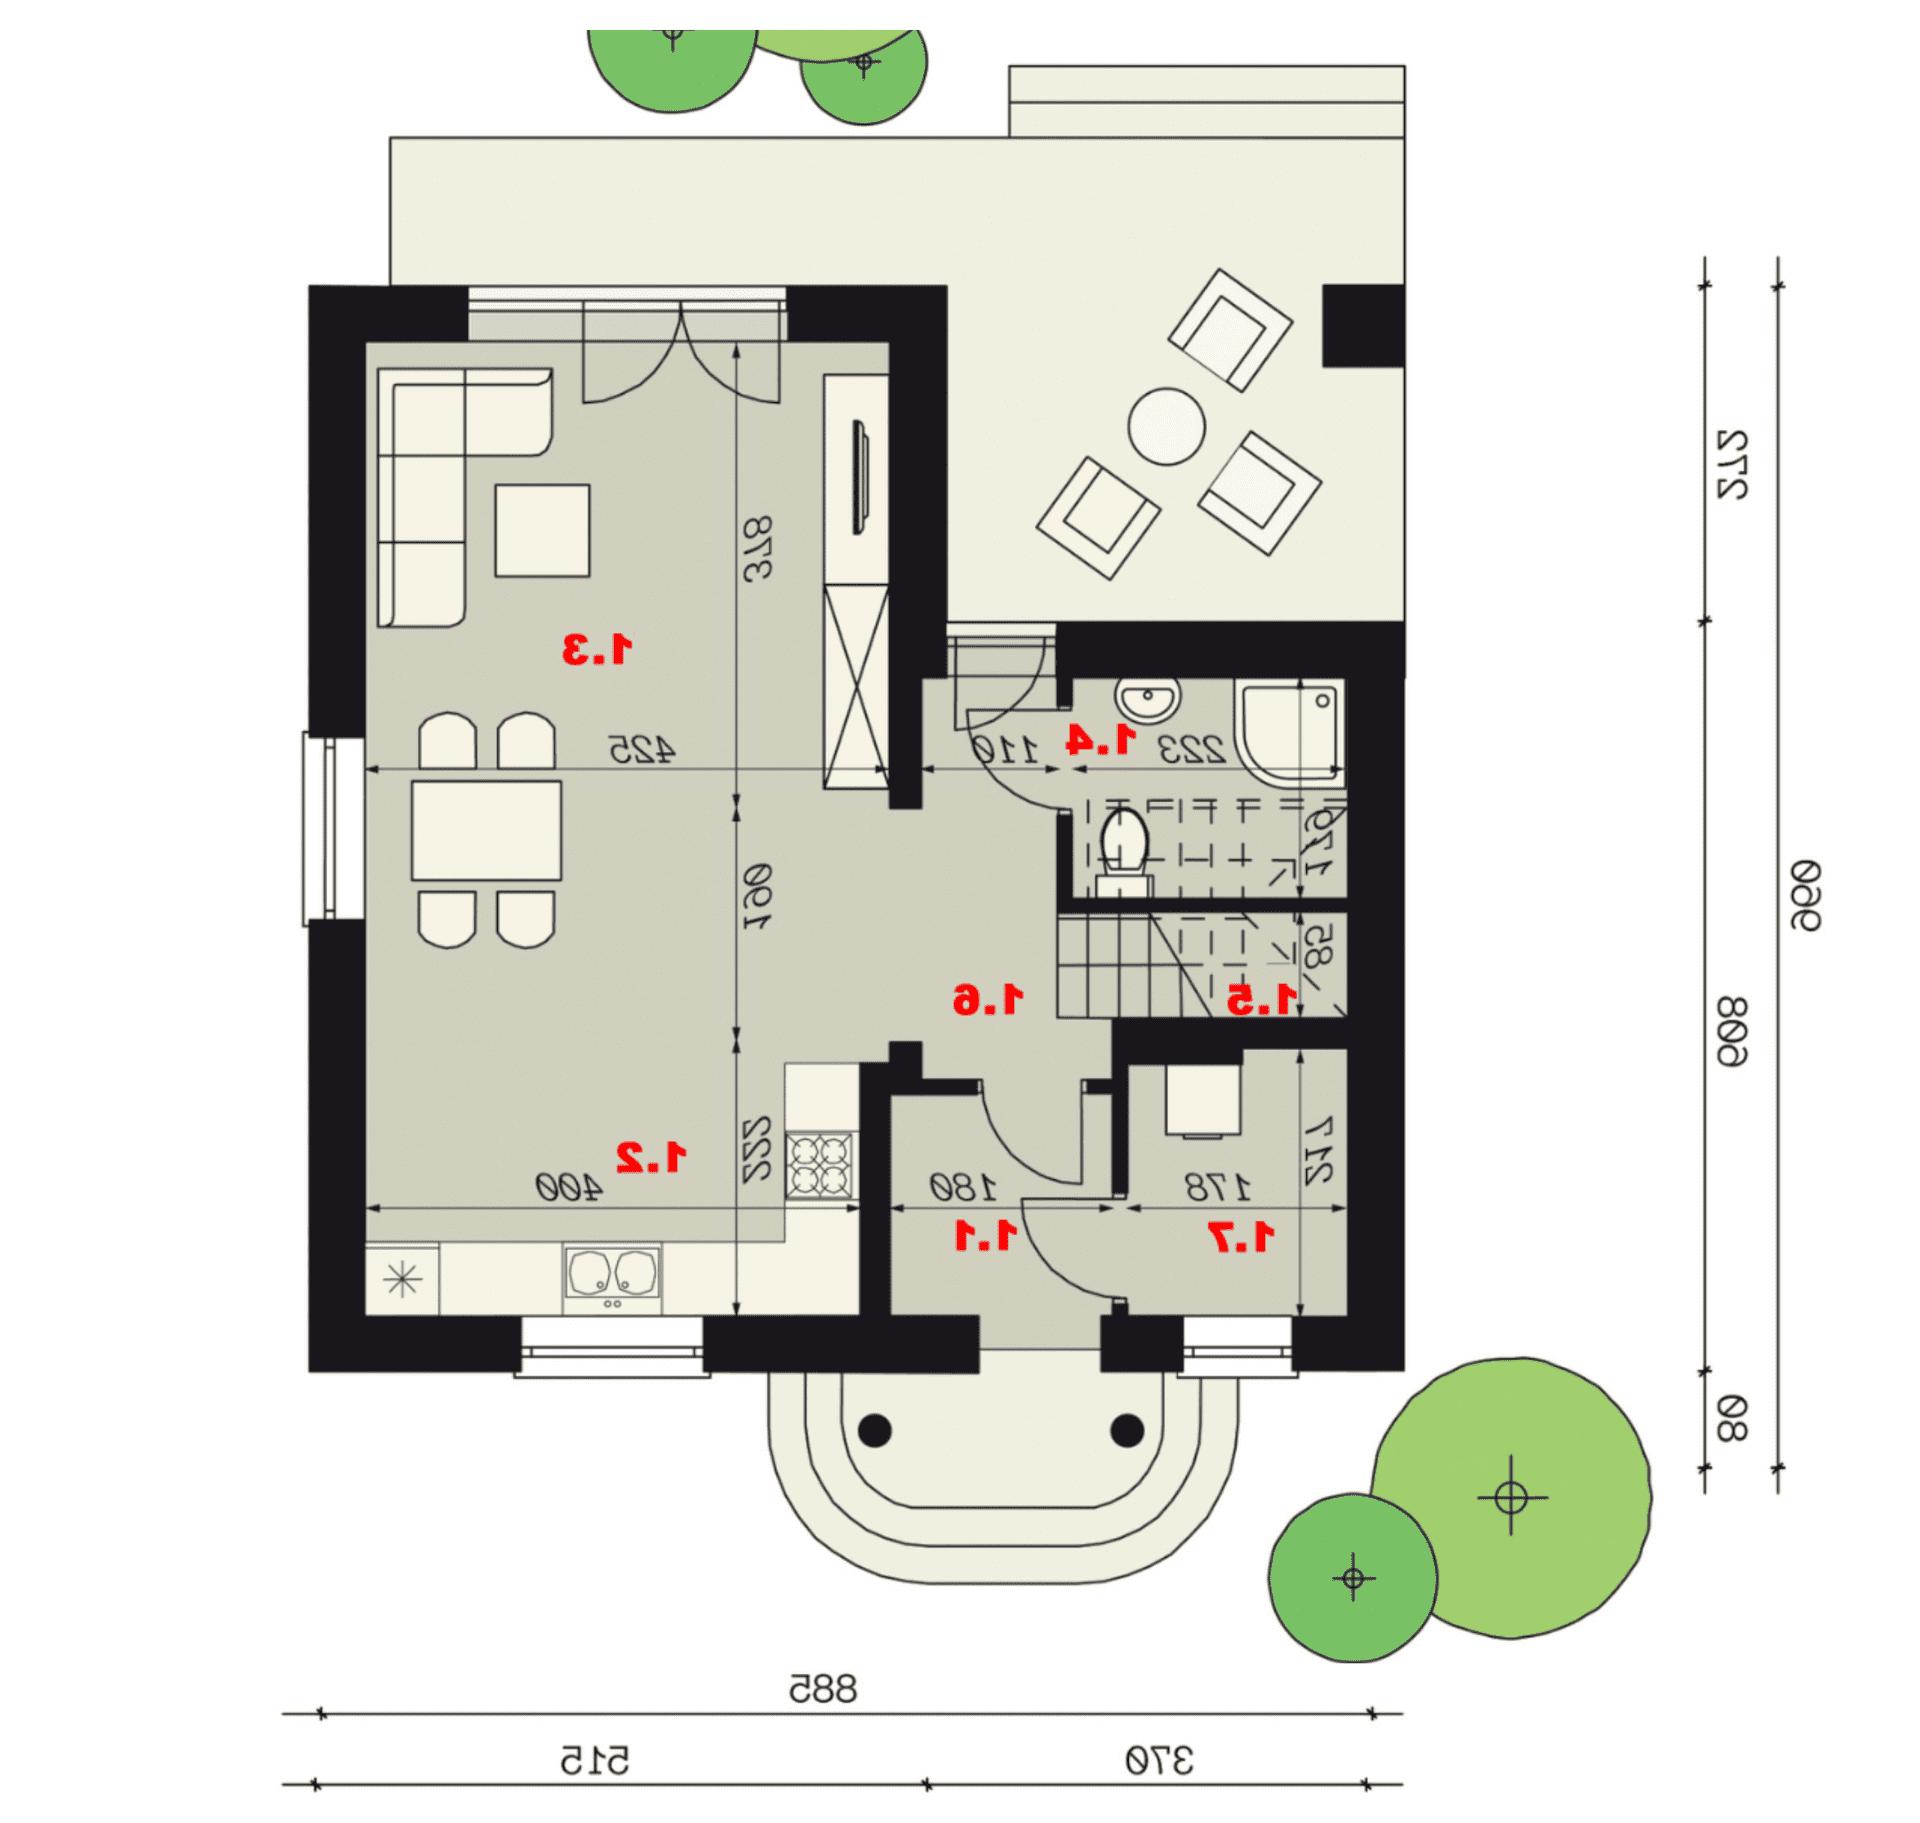 Rzut parteru - projekt domu SEJ-PRO 001 ENERGO - odbicie lustrzane